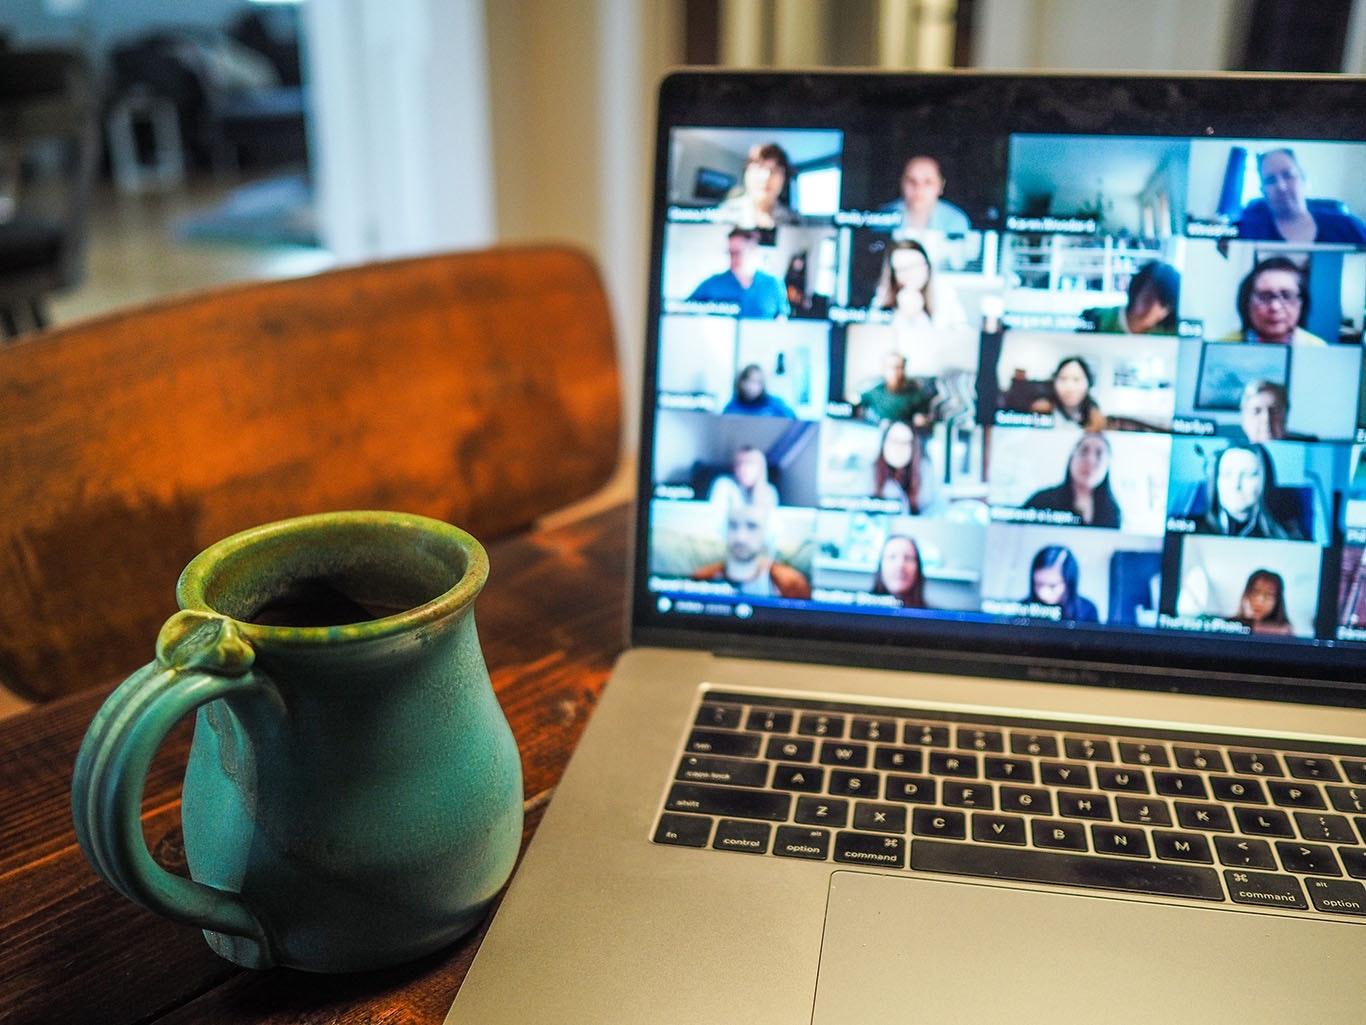 Comment vendre des formations en ligne - Infopreneur - Zoom